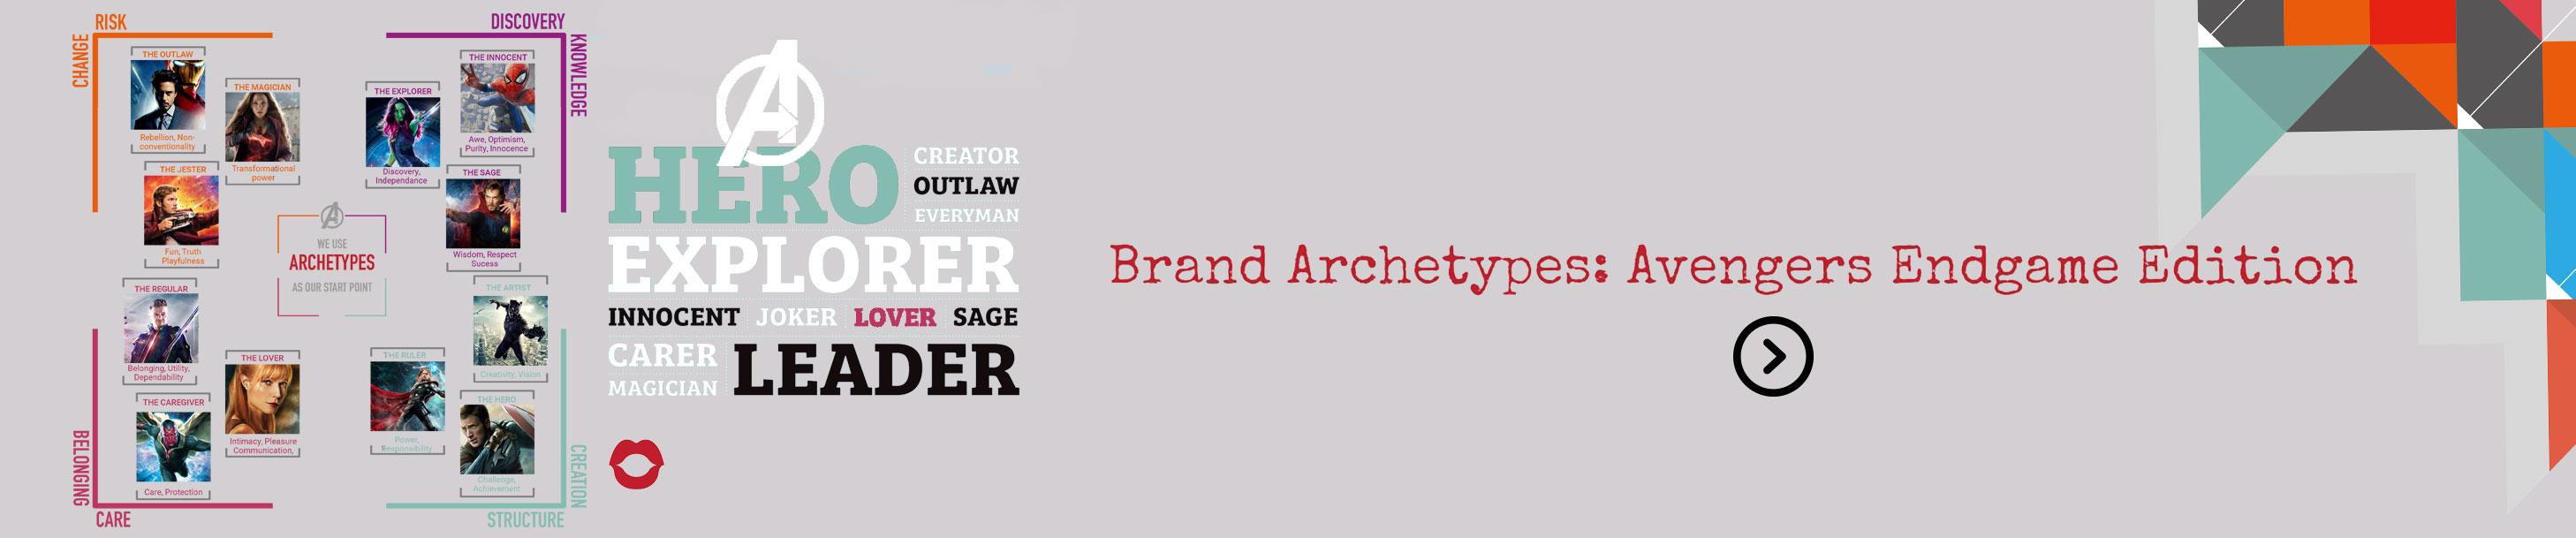 Brand-Archetypes-Avengers-Endgame-edition